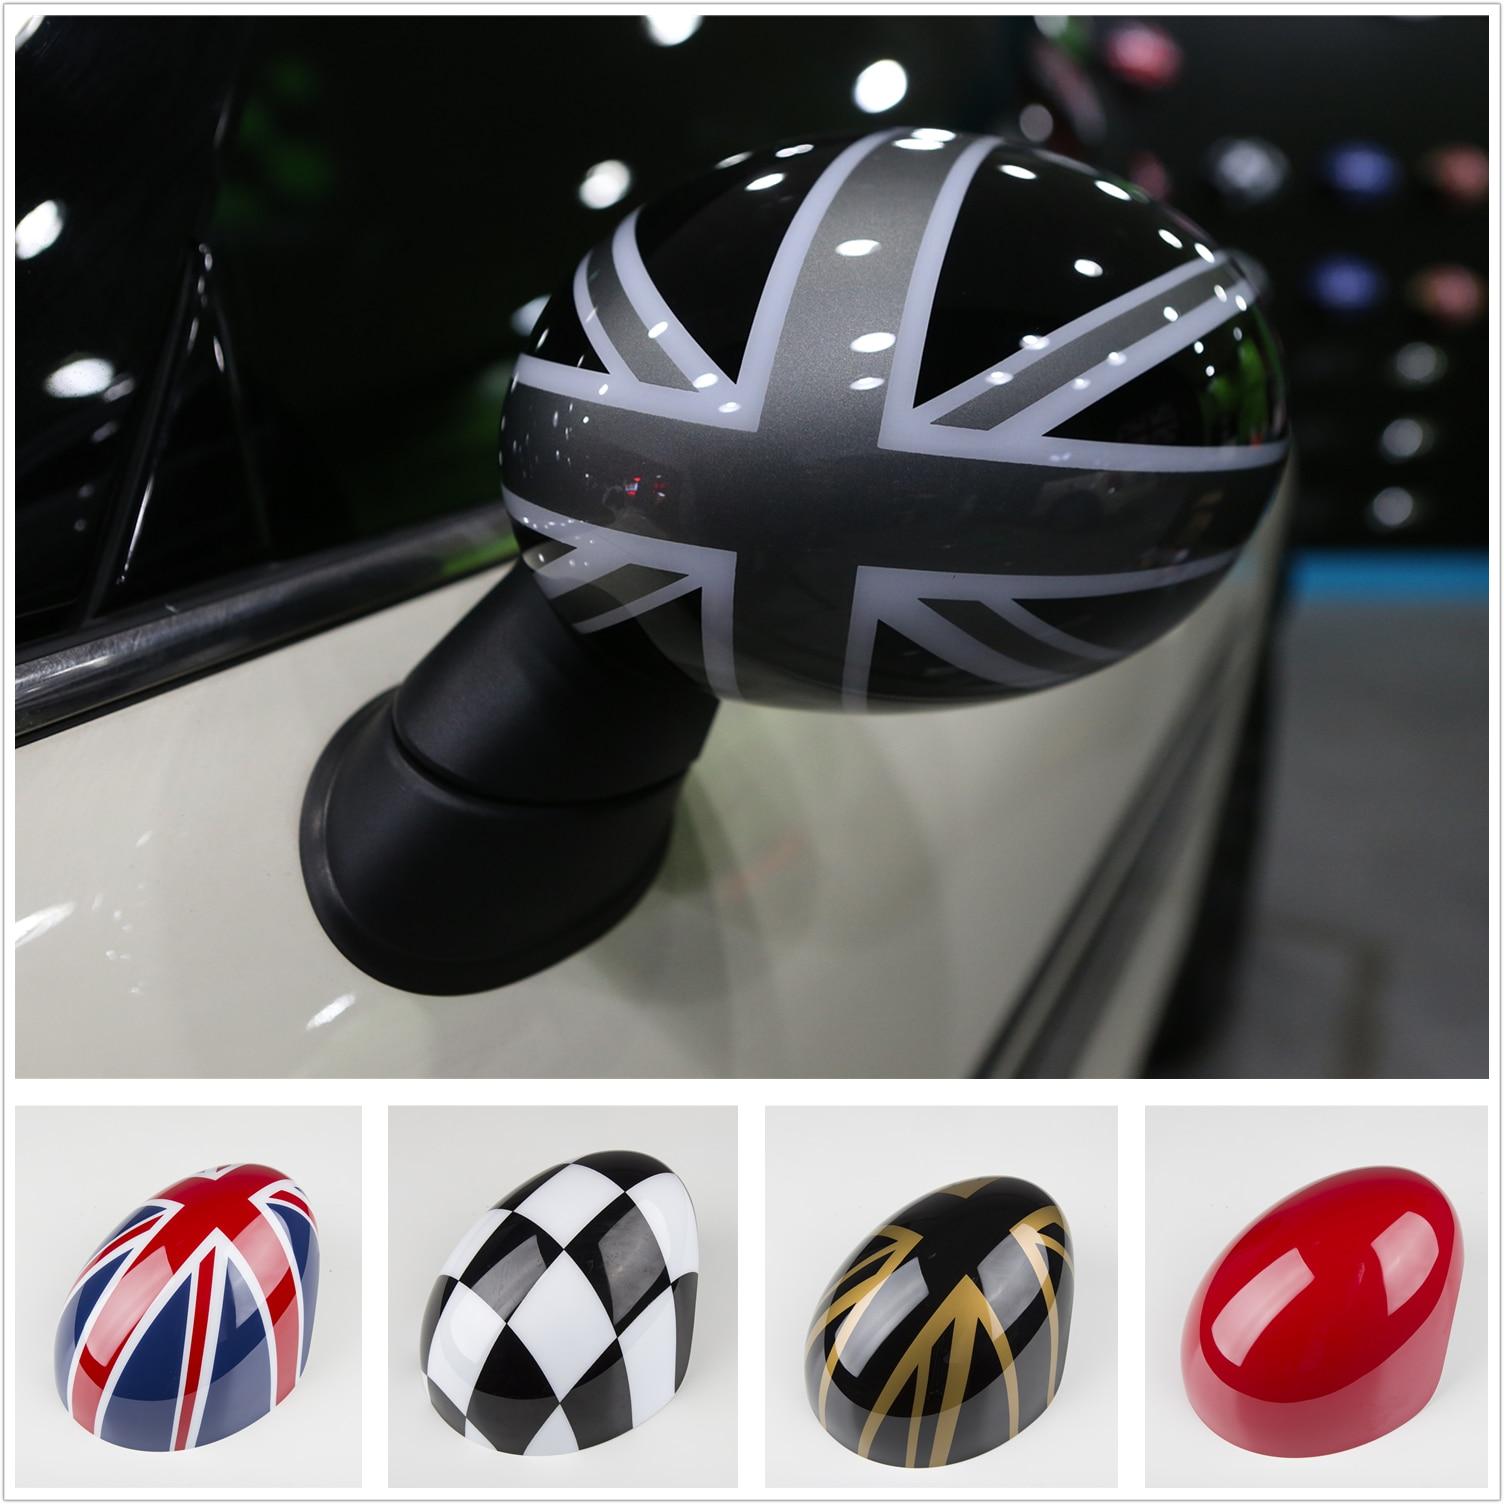 2pcs Side Wing Mirror Cover Cap Trim For Mini Cooper R Series R50 R53 R52 2000-2008 Fashion Decoration Car Decal Accessories